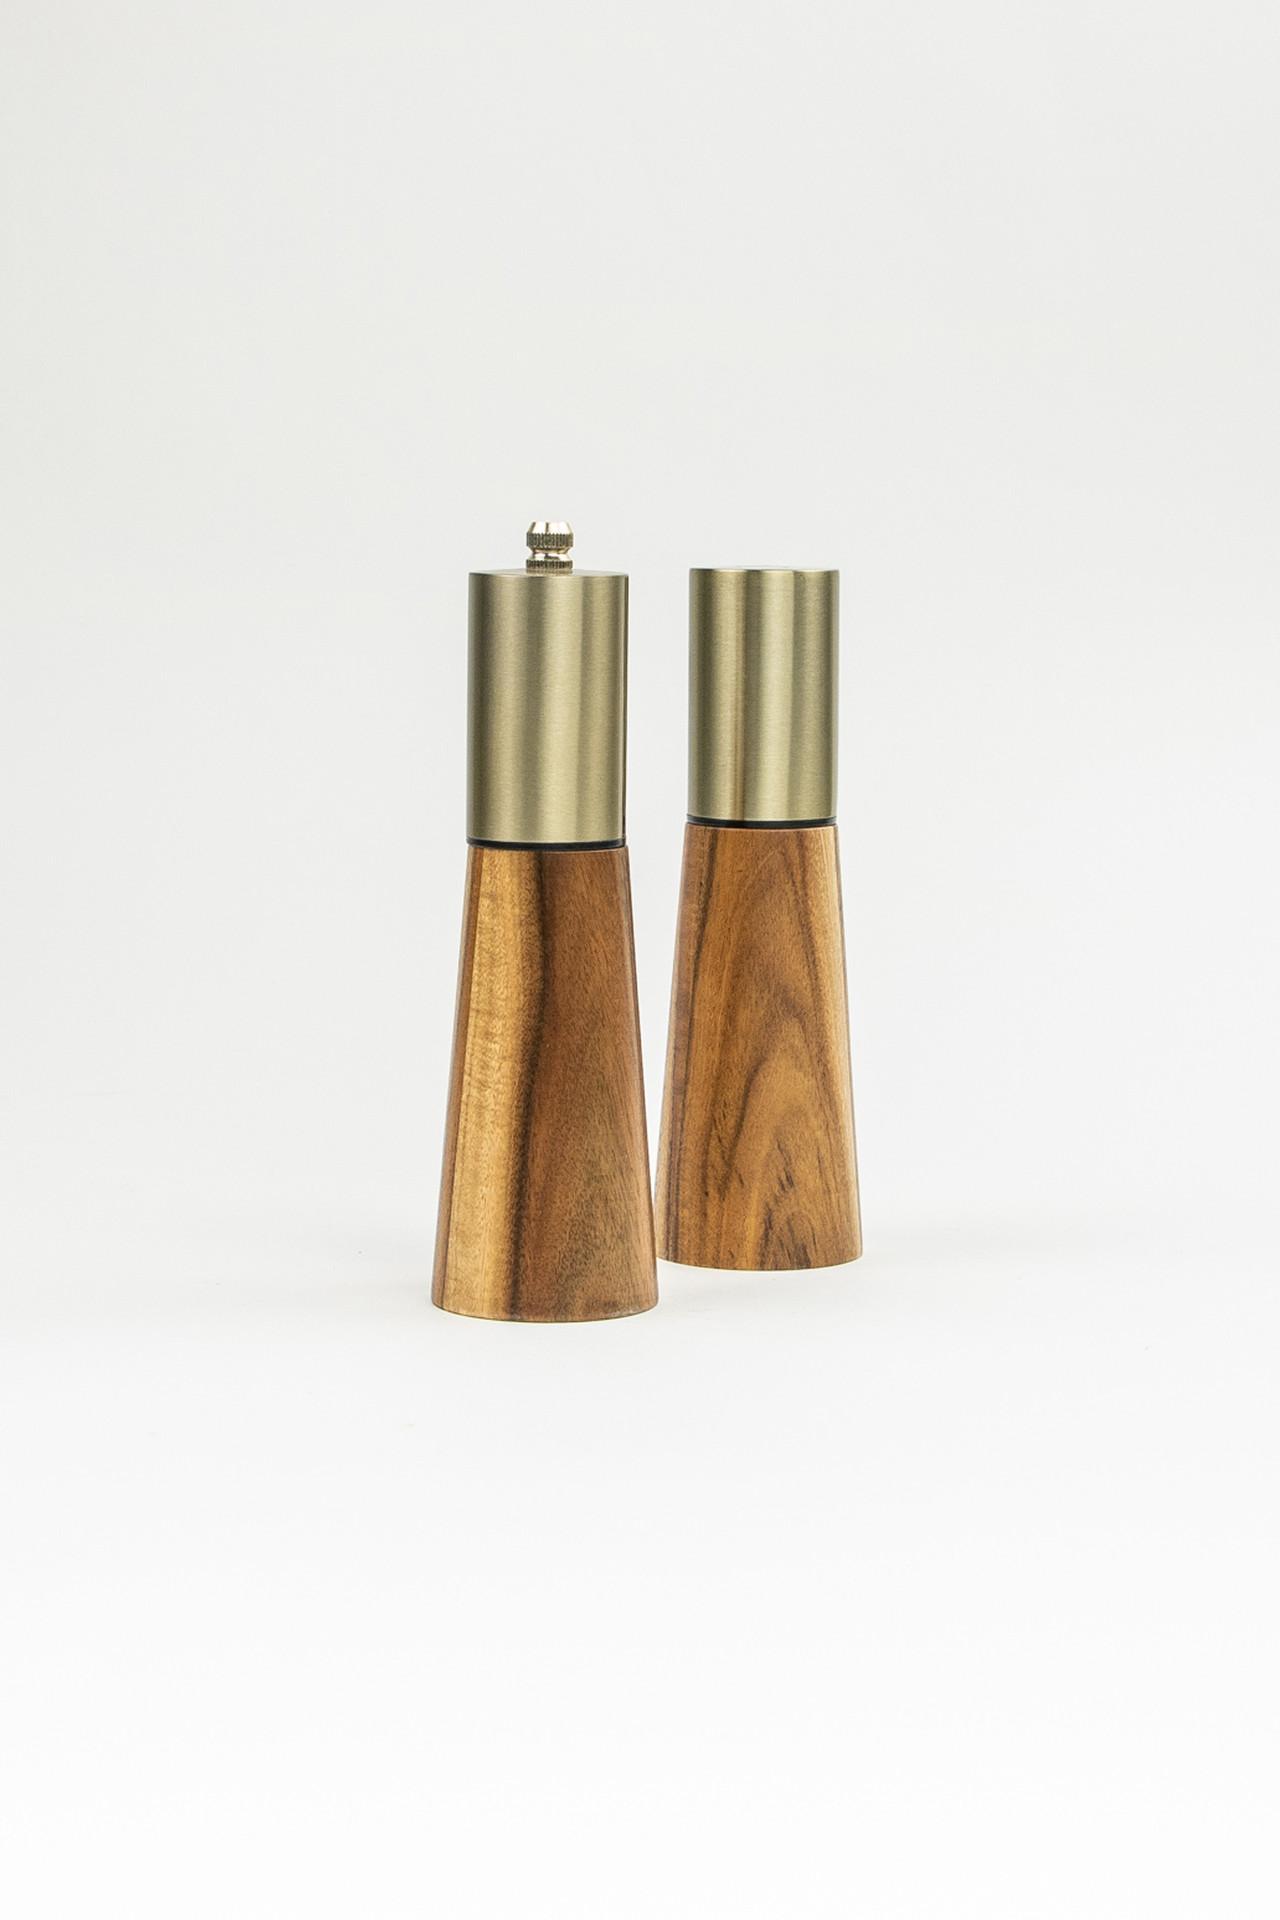 Acacia Wood Salt and Pepper Shaker Set